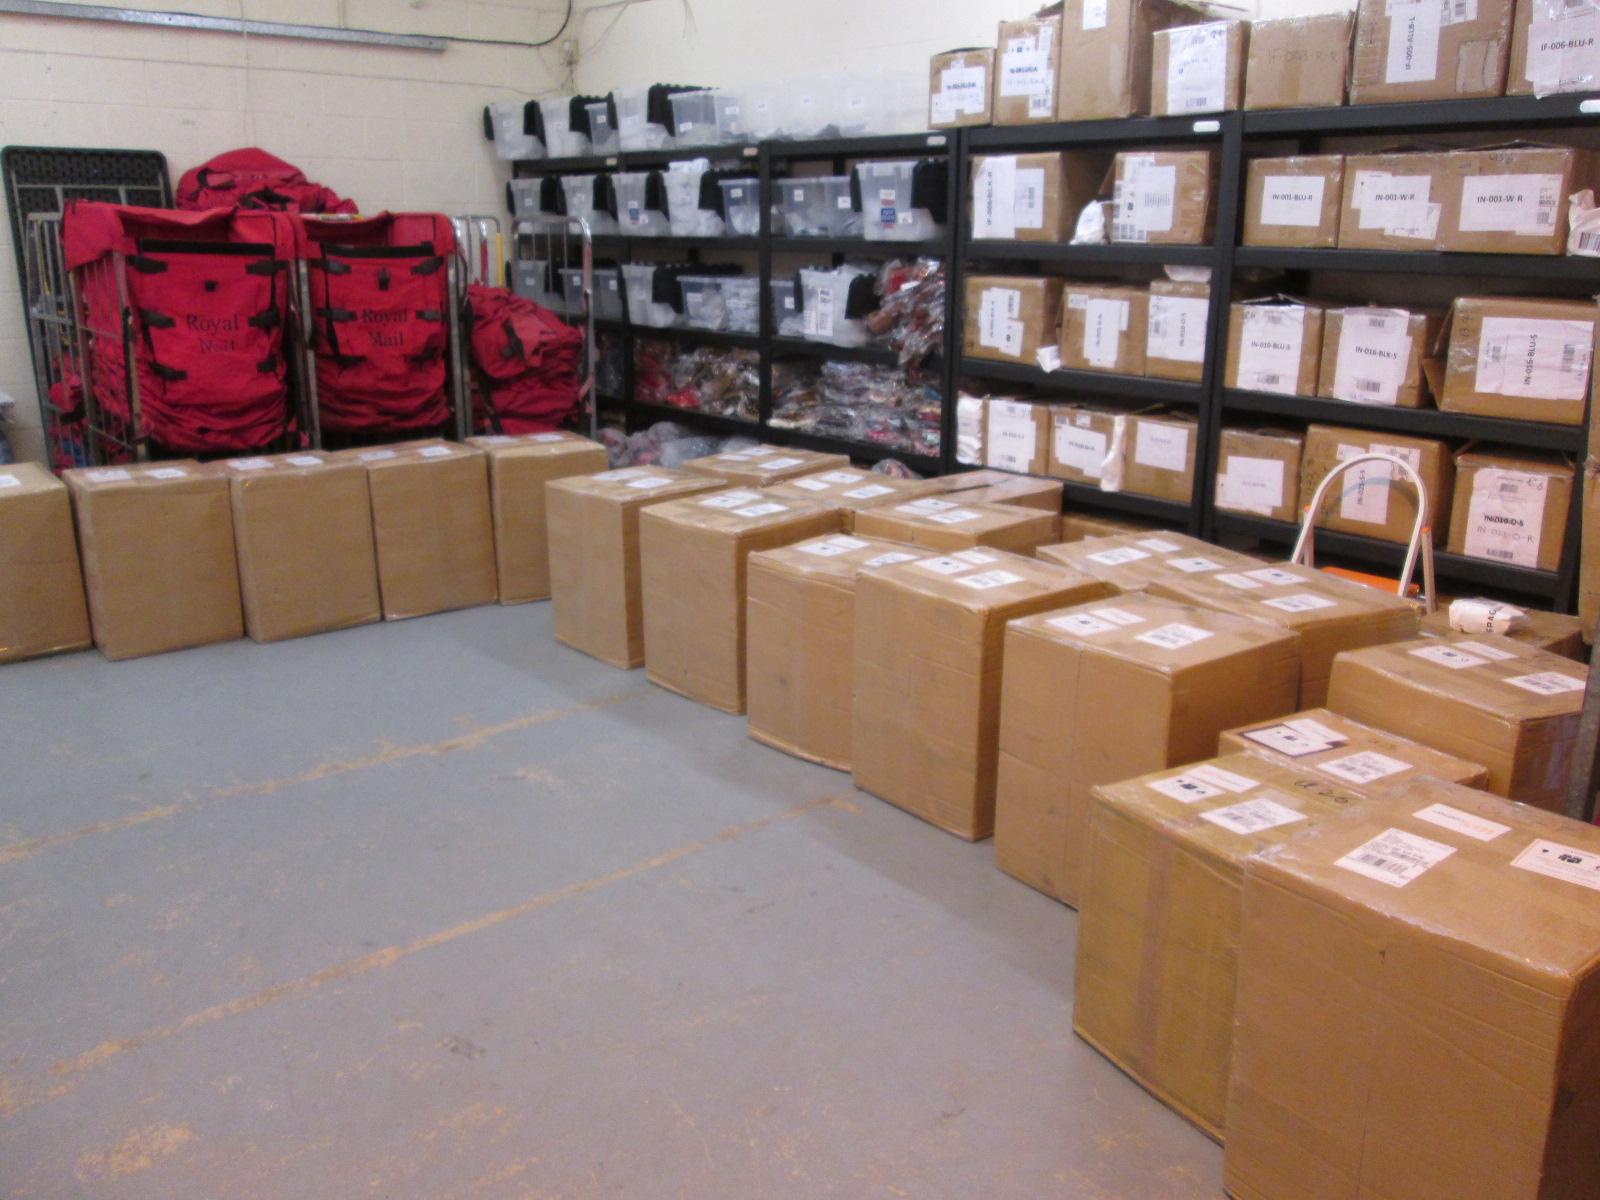 UPS Box Arrival